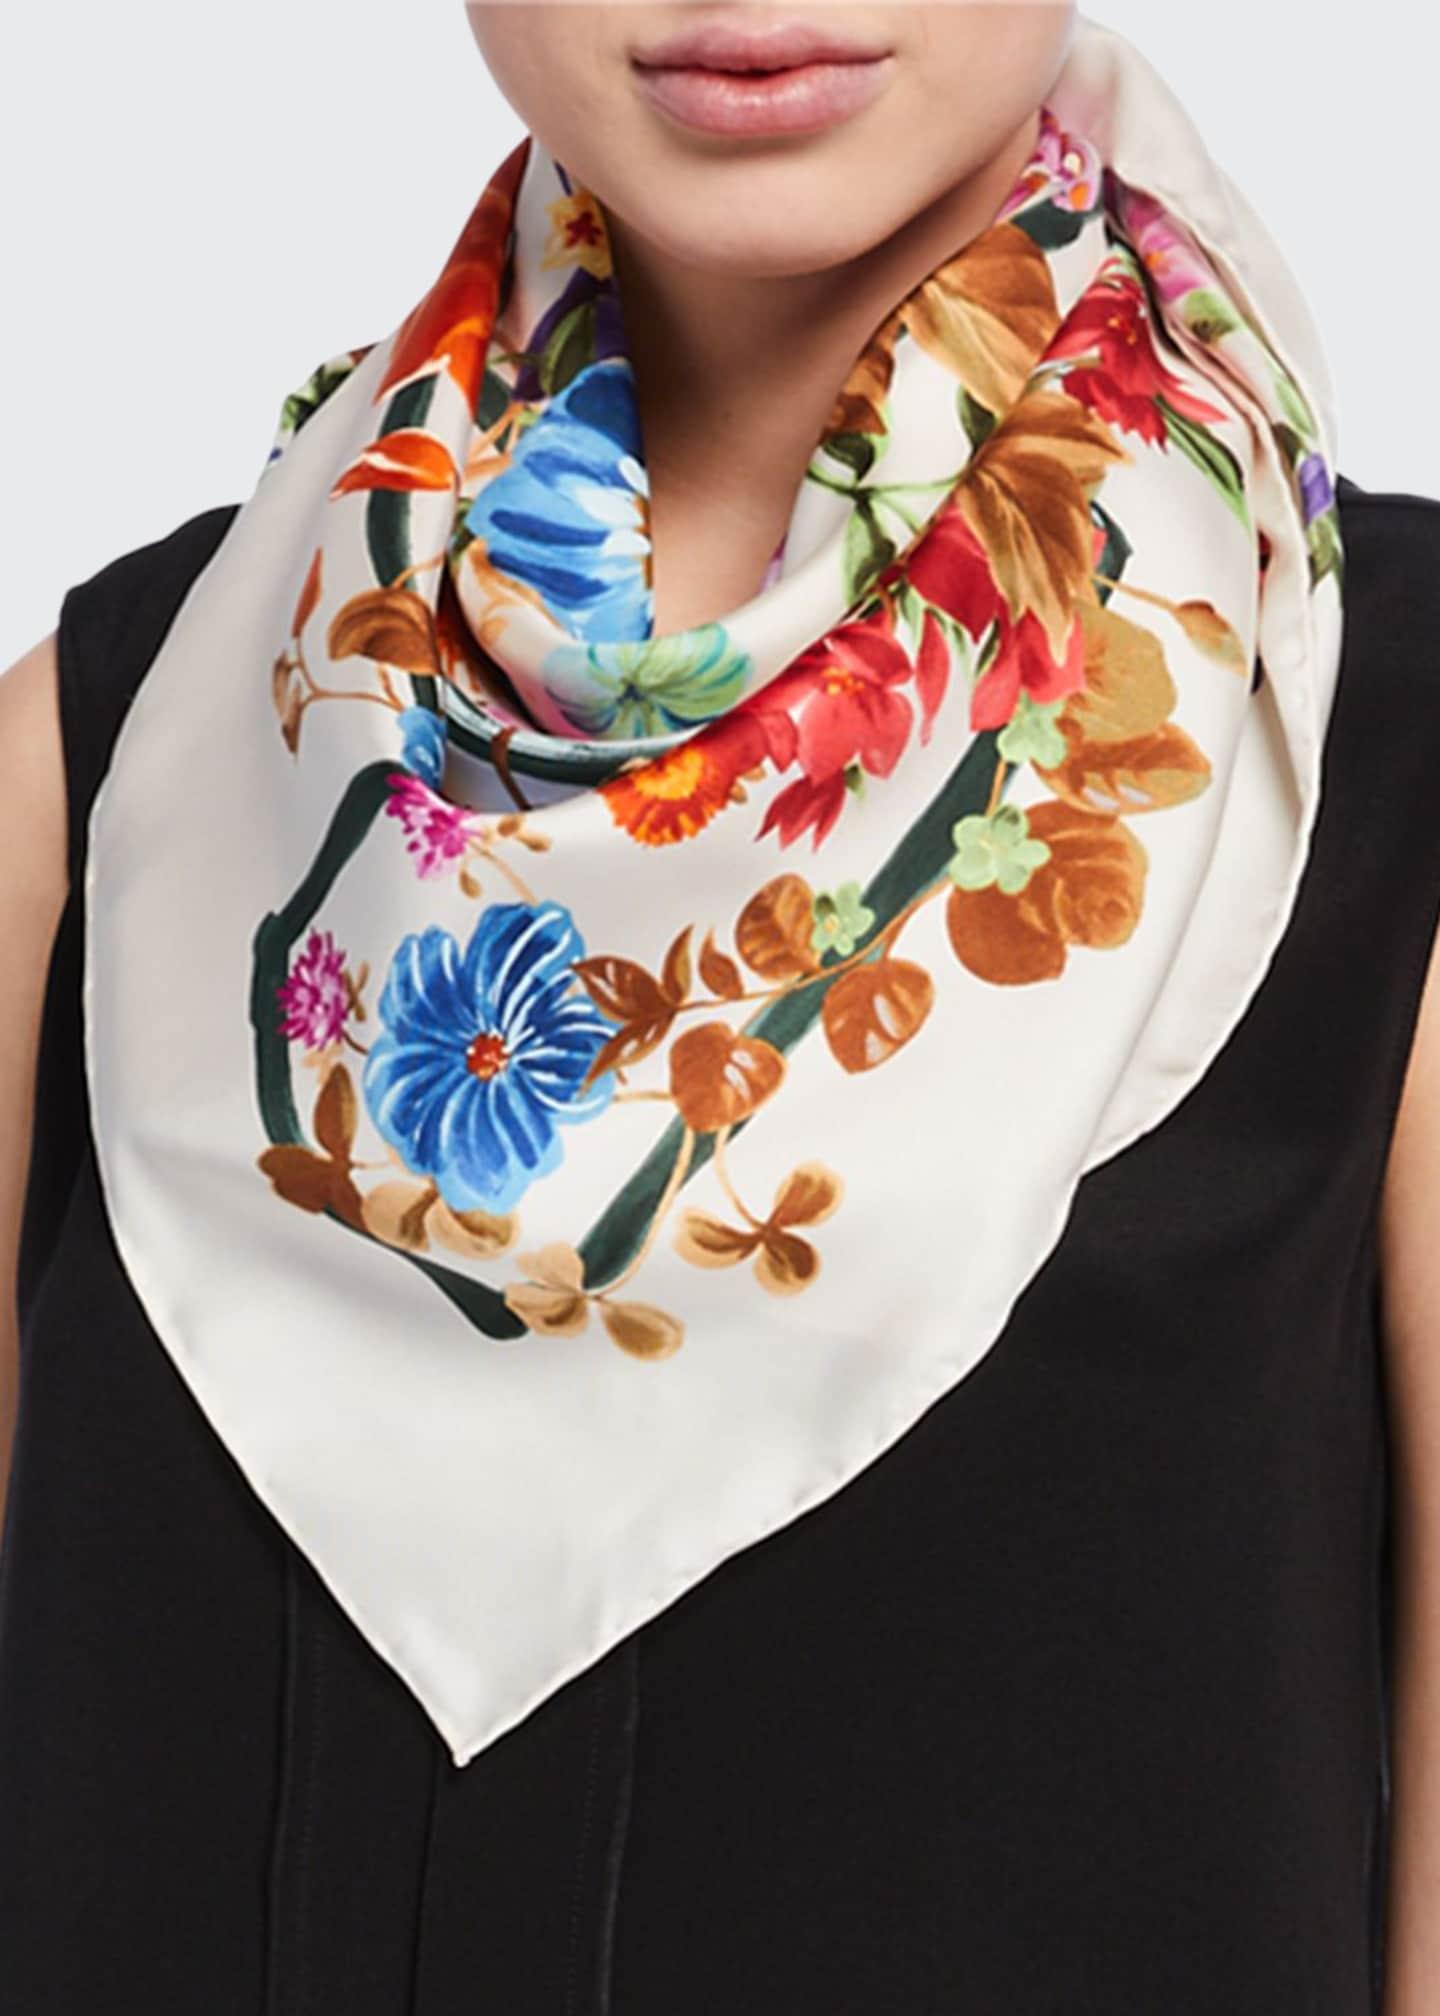 Salvatore Ferragamo Fiorile Floral-Printed Silk Scarf